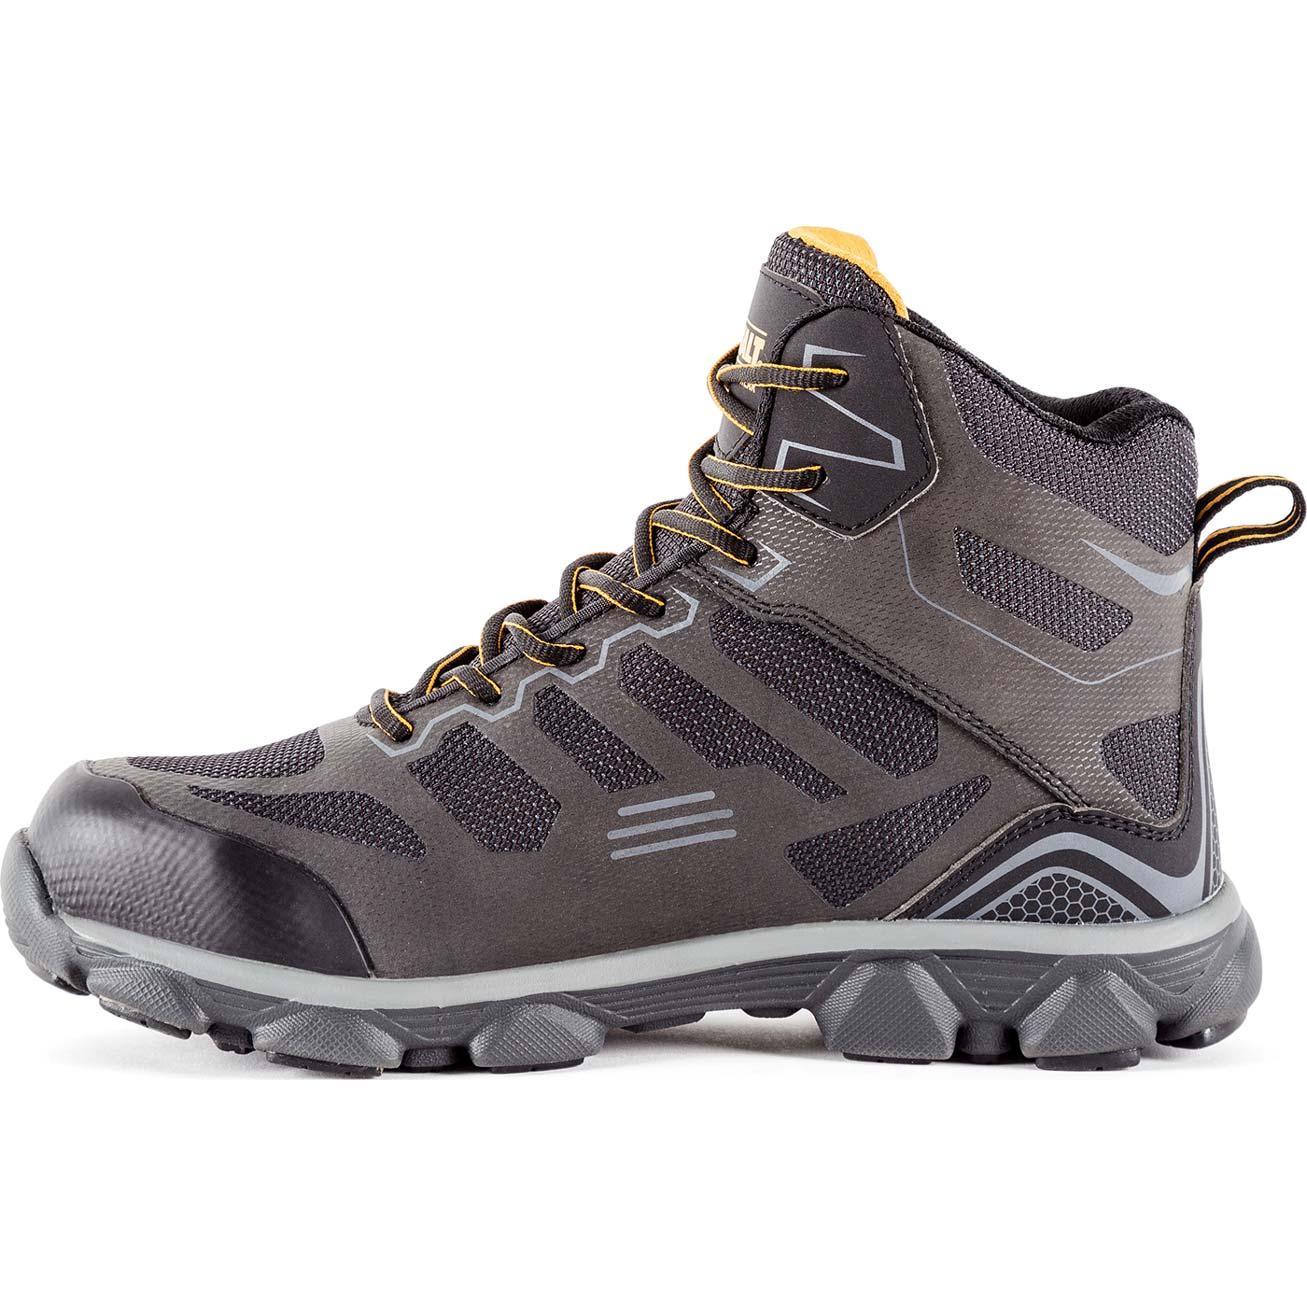 a711611c8c6 DEWALT® Crossfire Mid Aluminum Toe Kevlar Puncture-Resistant Work Hiker